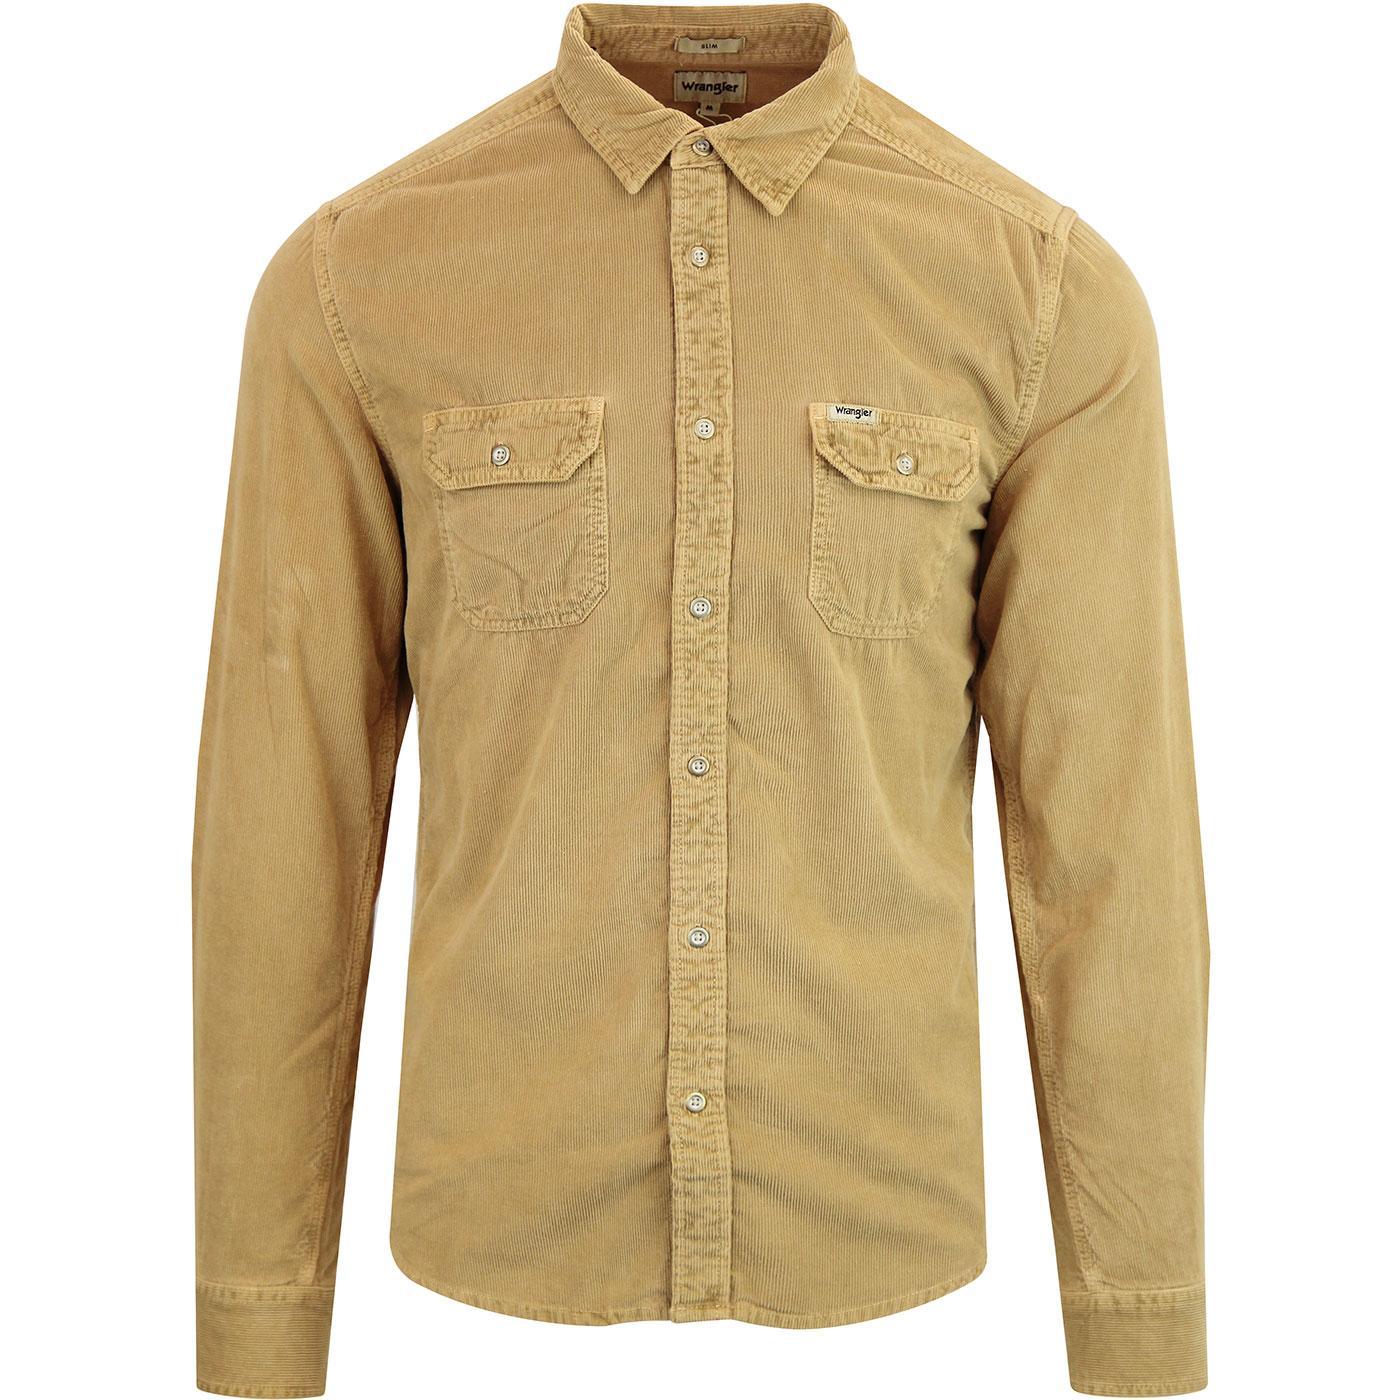 WRANGLER Retro 70s Western Flap Pocket Cord Shirt